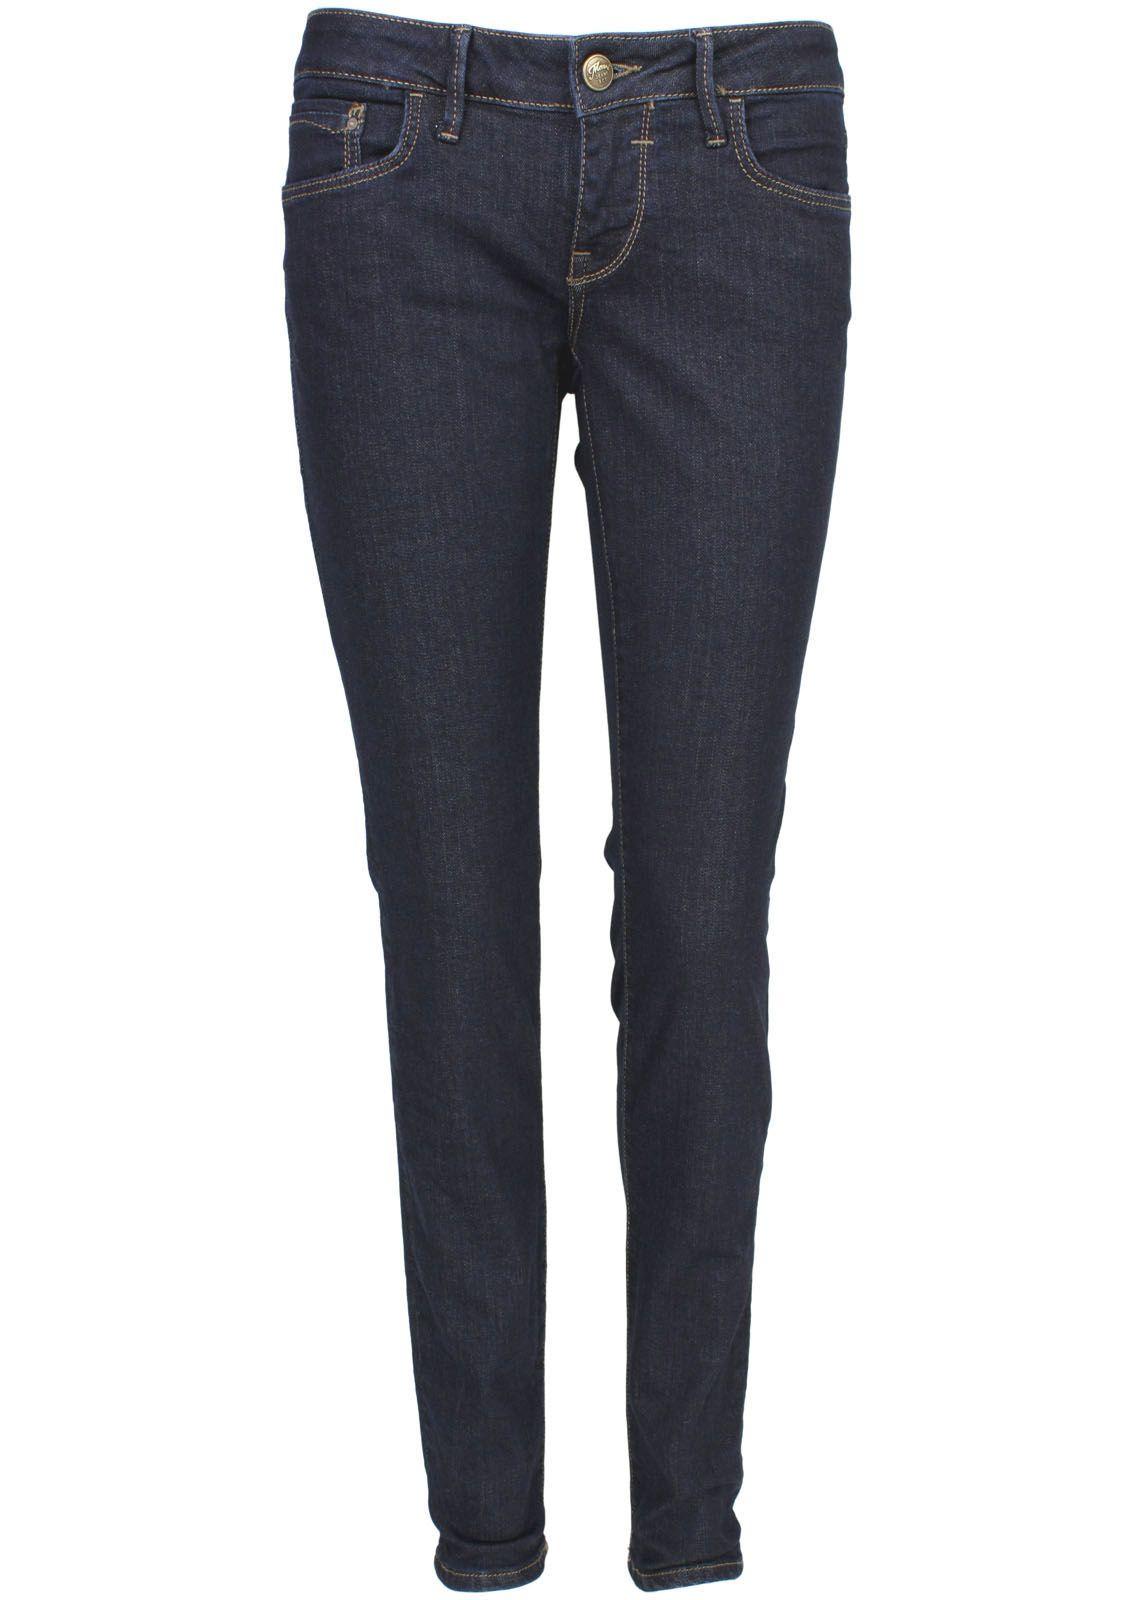 mavi jeans lindy rinse valencia fettebeute online shop. Black Bedroom Furniture Sets. Home Design Ideas